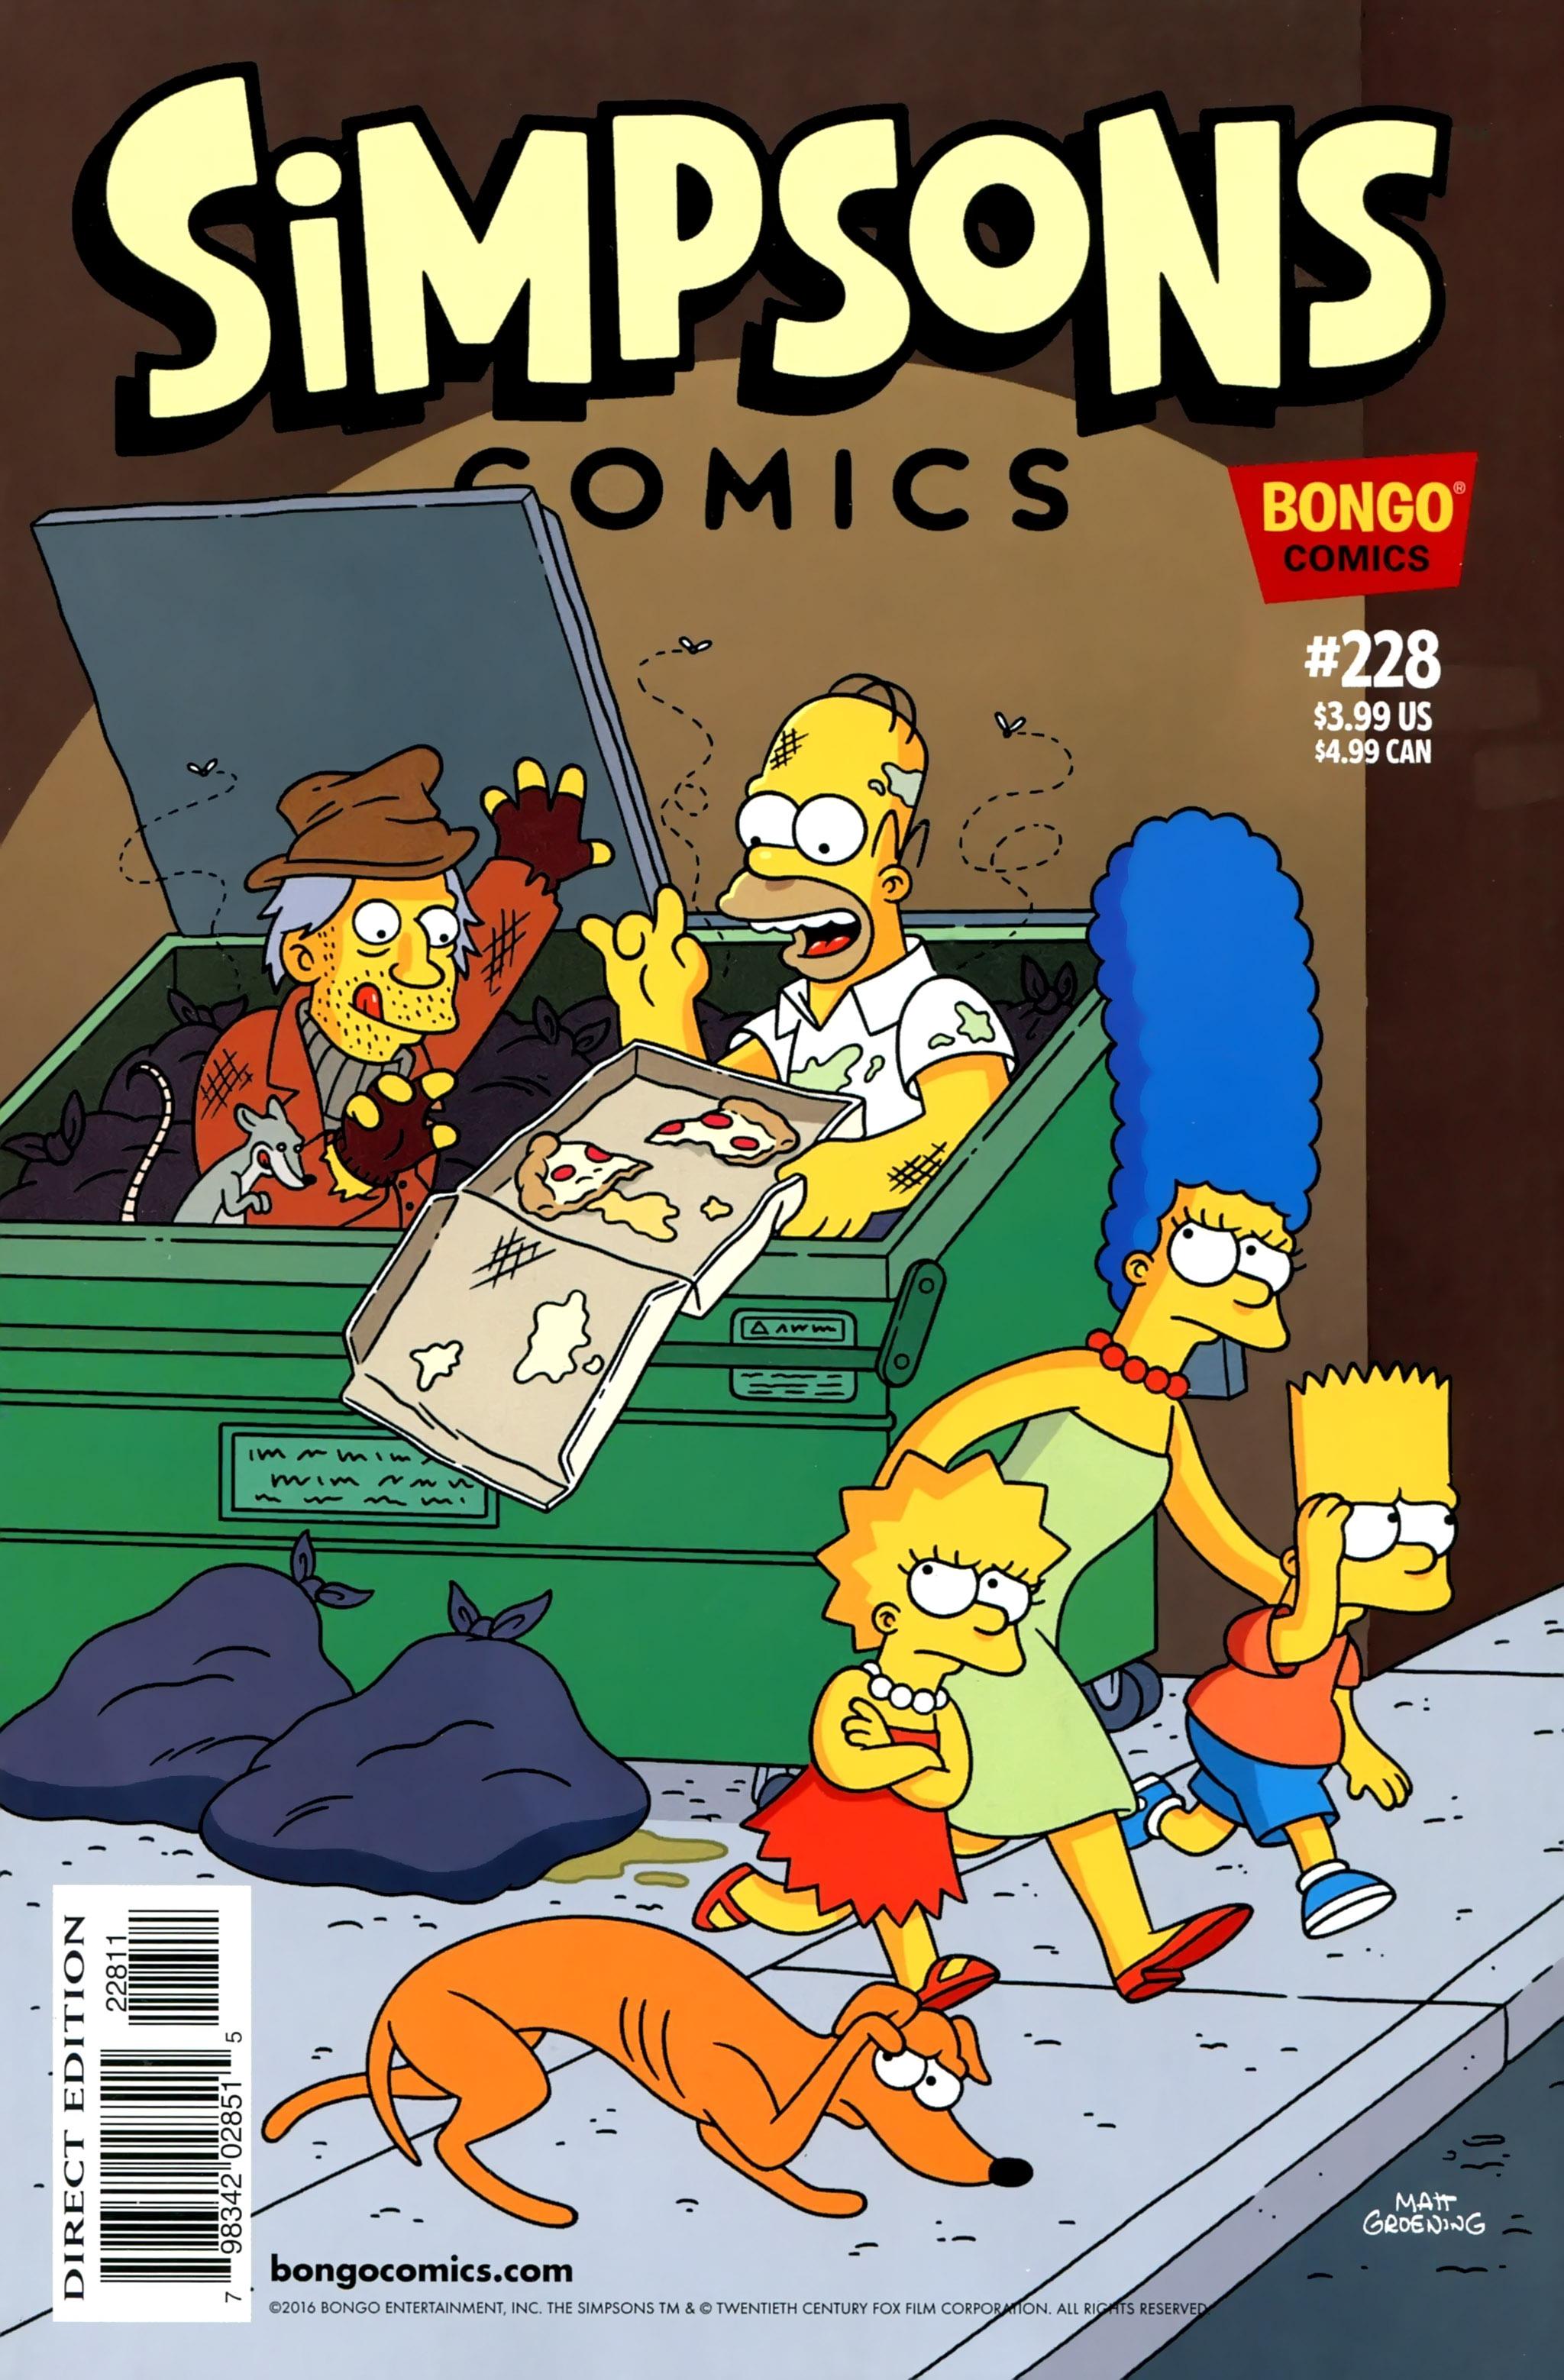 Simpsons Comics 228 Page 1